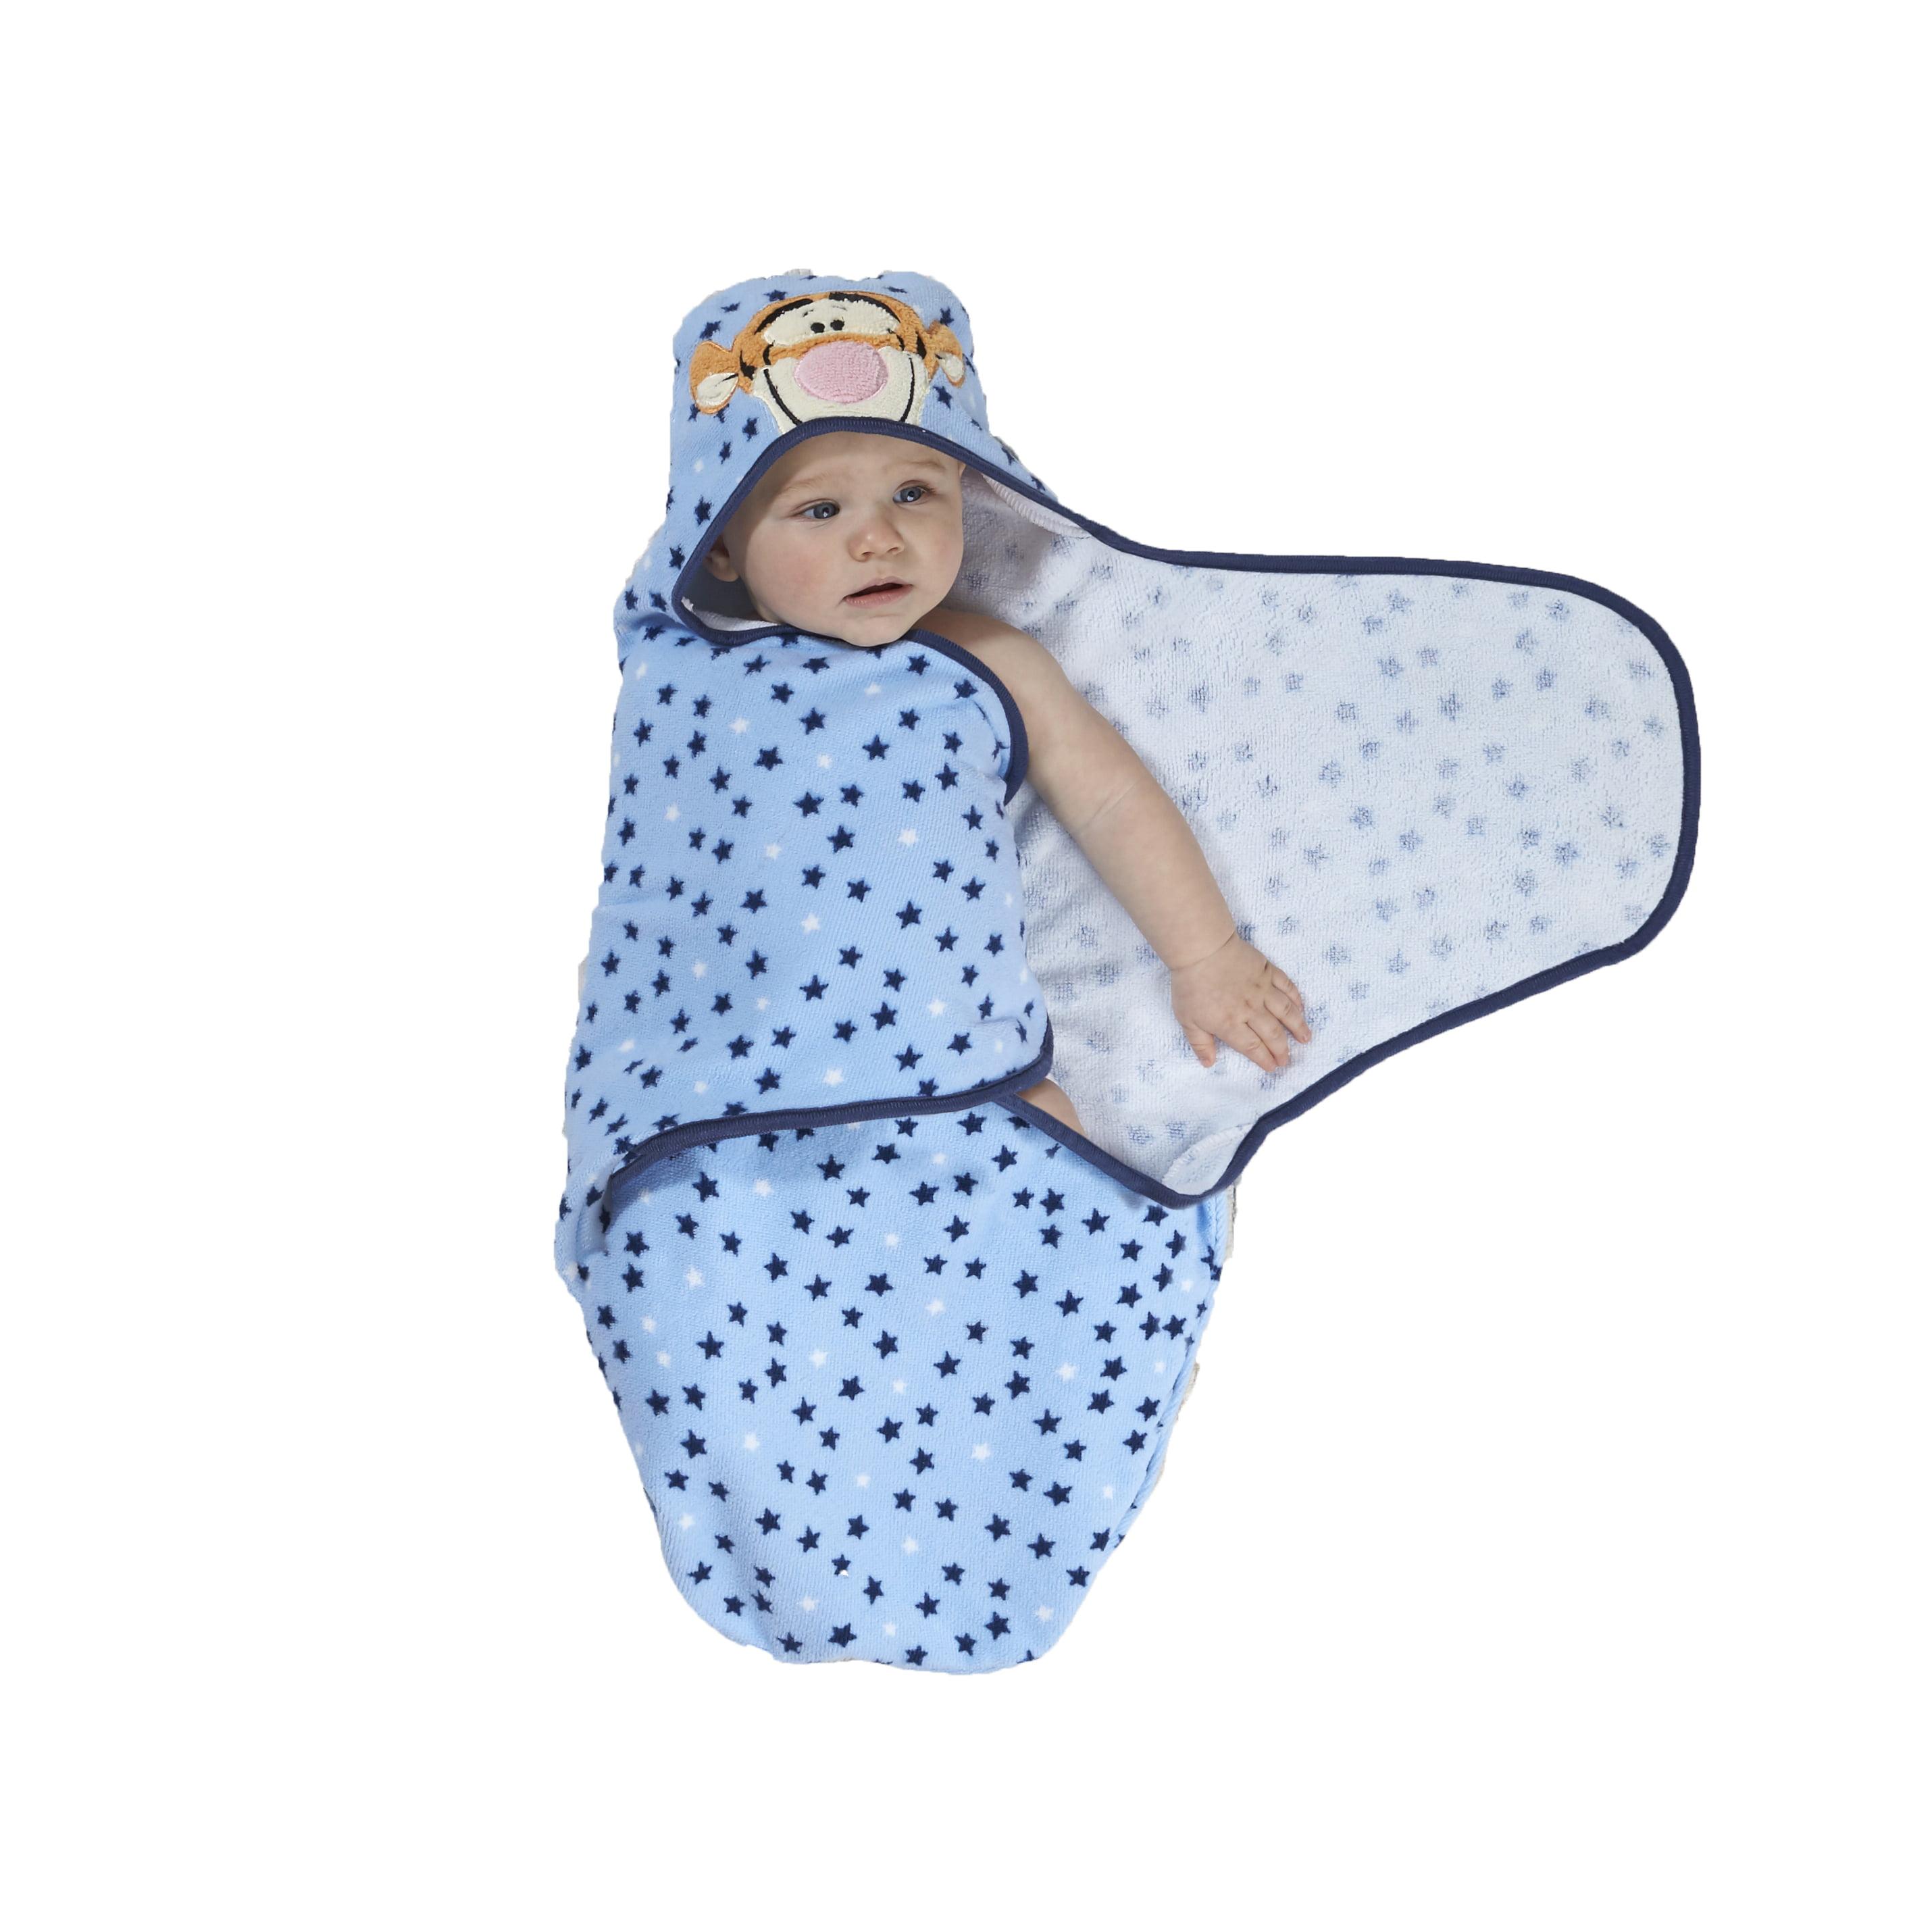 Disney Baby Tigger Embroidered Hooded Bath Swaddle - Walmart.com